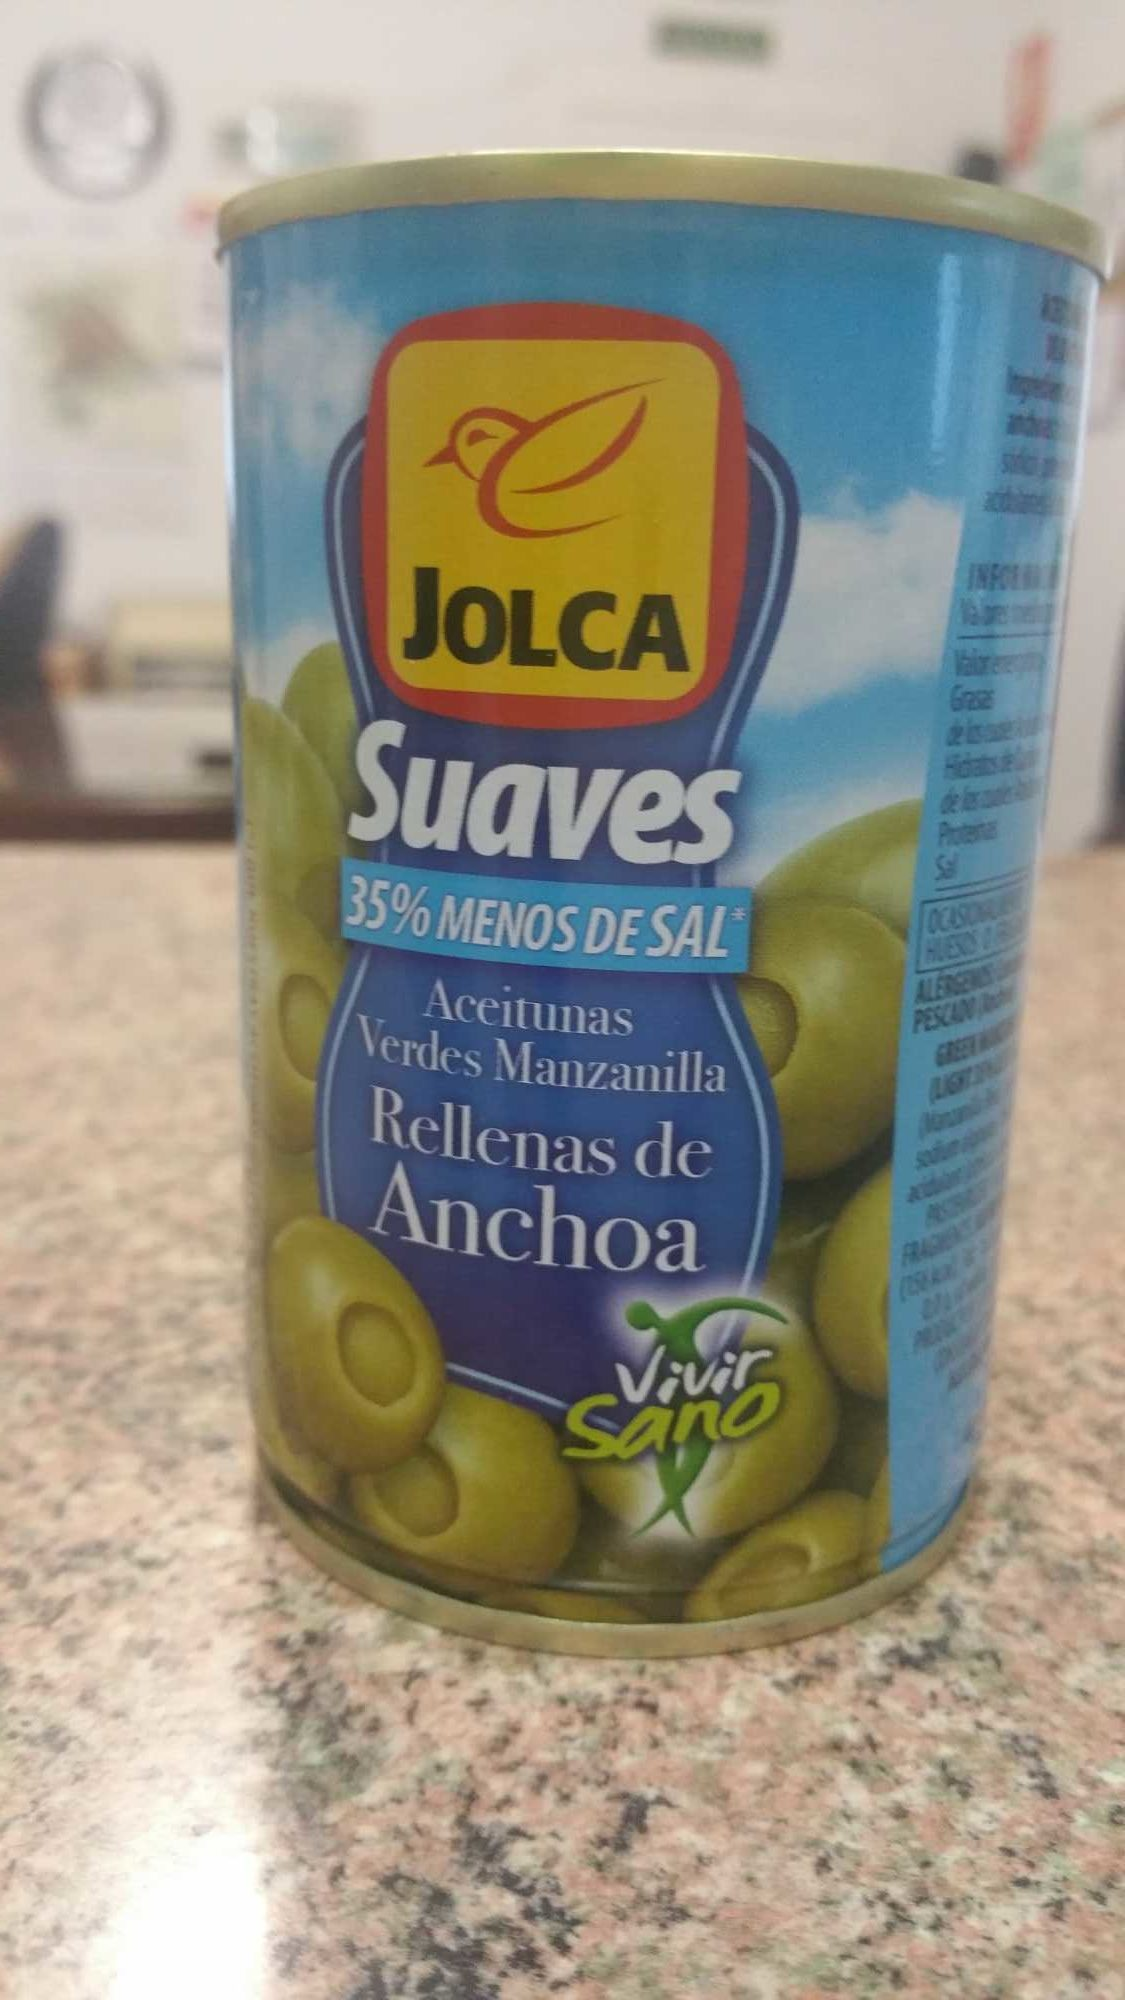 Aceitunas verdes manzanilla rellenas anchoa - Product - es